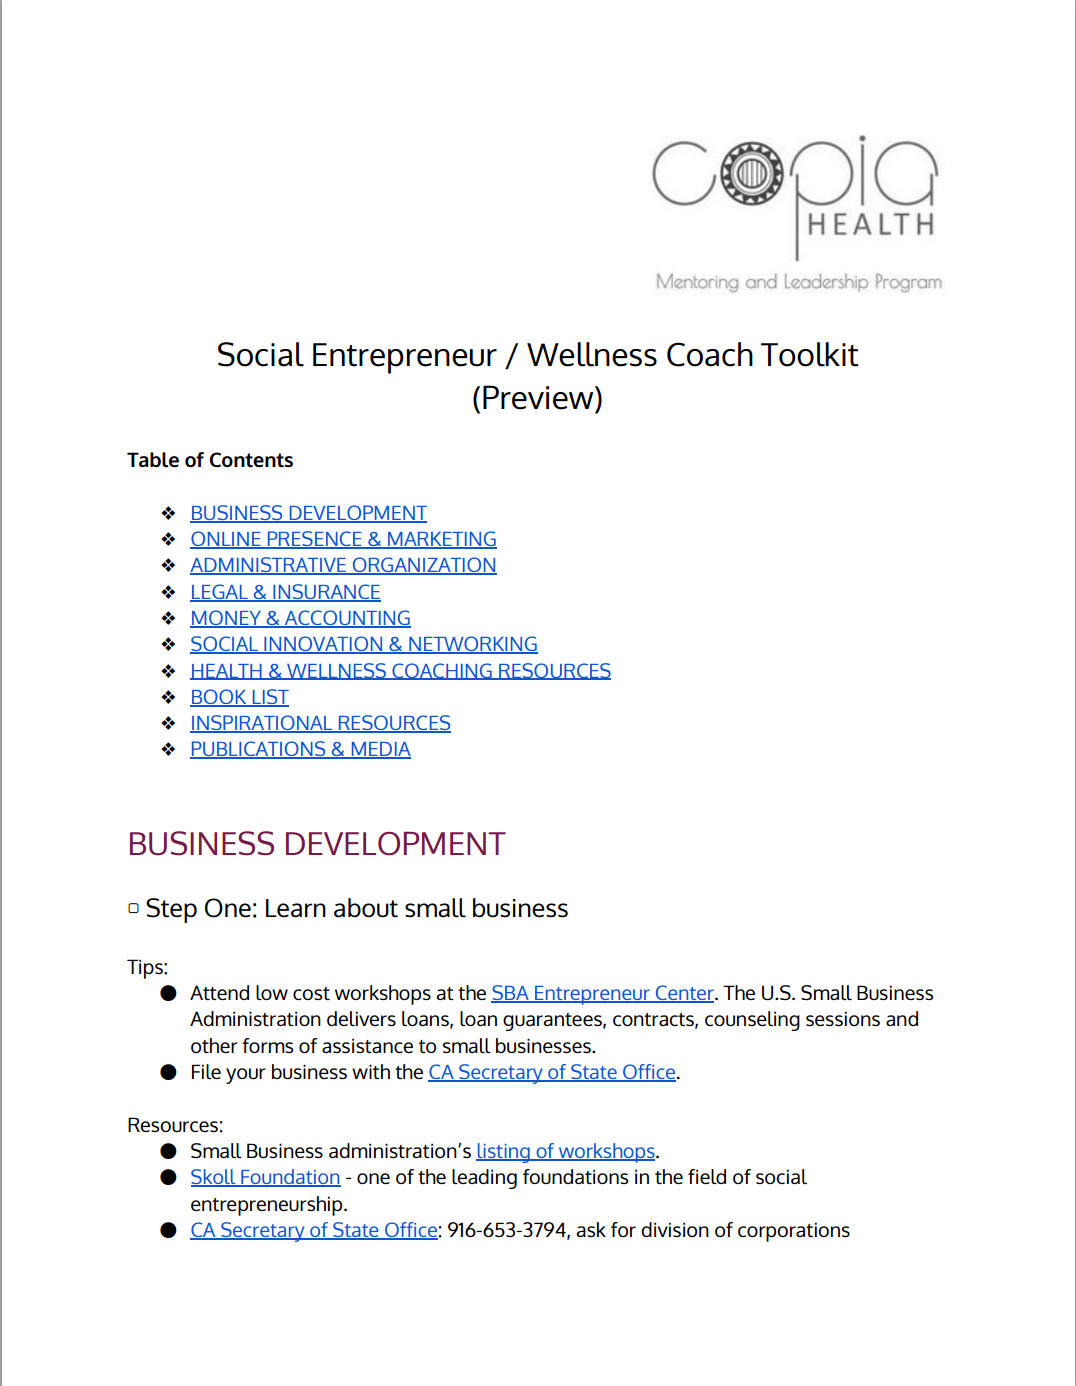 SOCIAL ENTREPRENEUR / WELLNESS COACH TOOLKIT (PREVIEW)